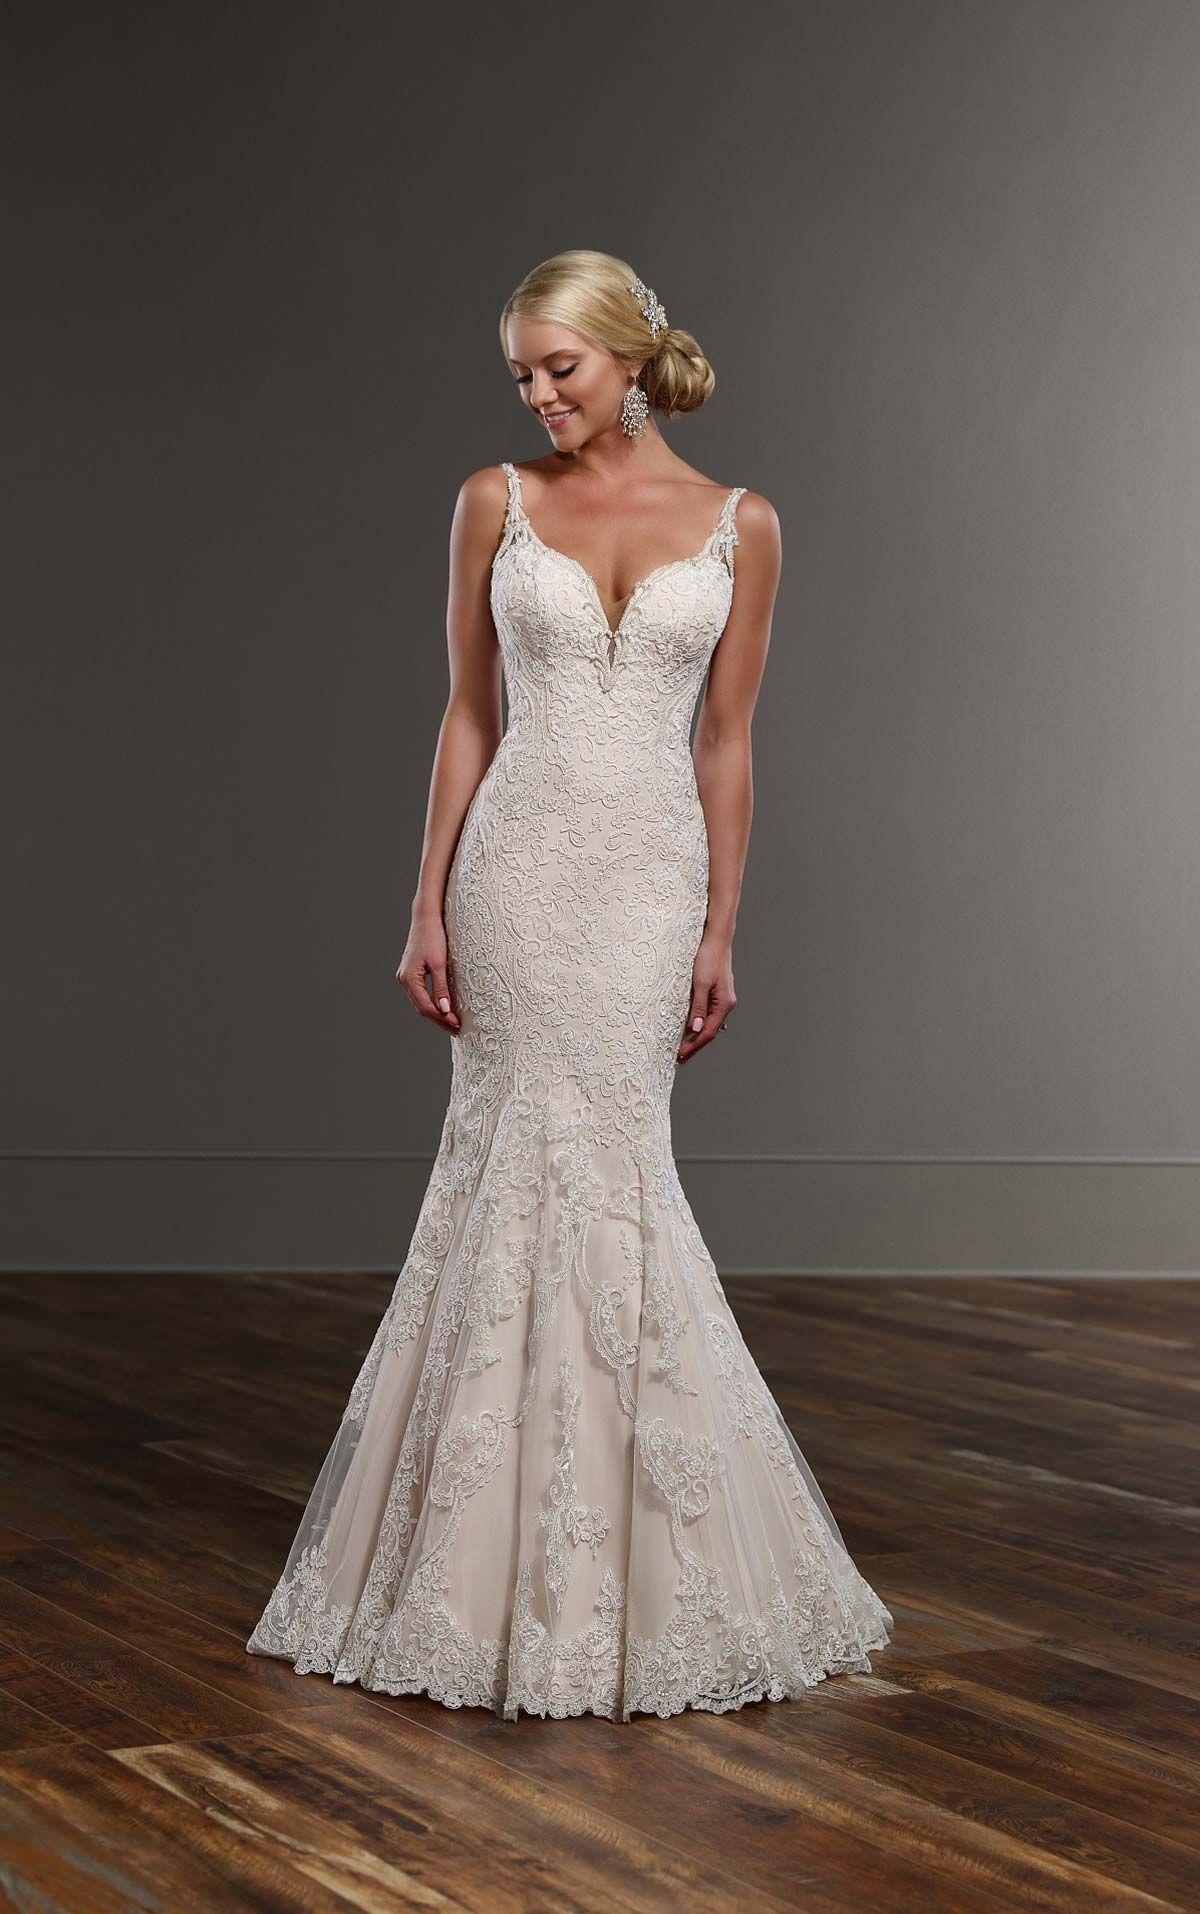 Fit and flare dress wedding  Designer Wedding Gown  Wedding dress Backless wedding and Weddings